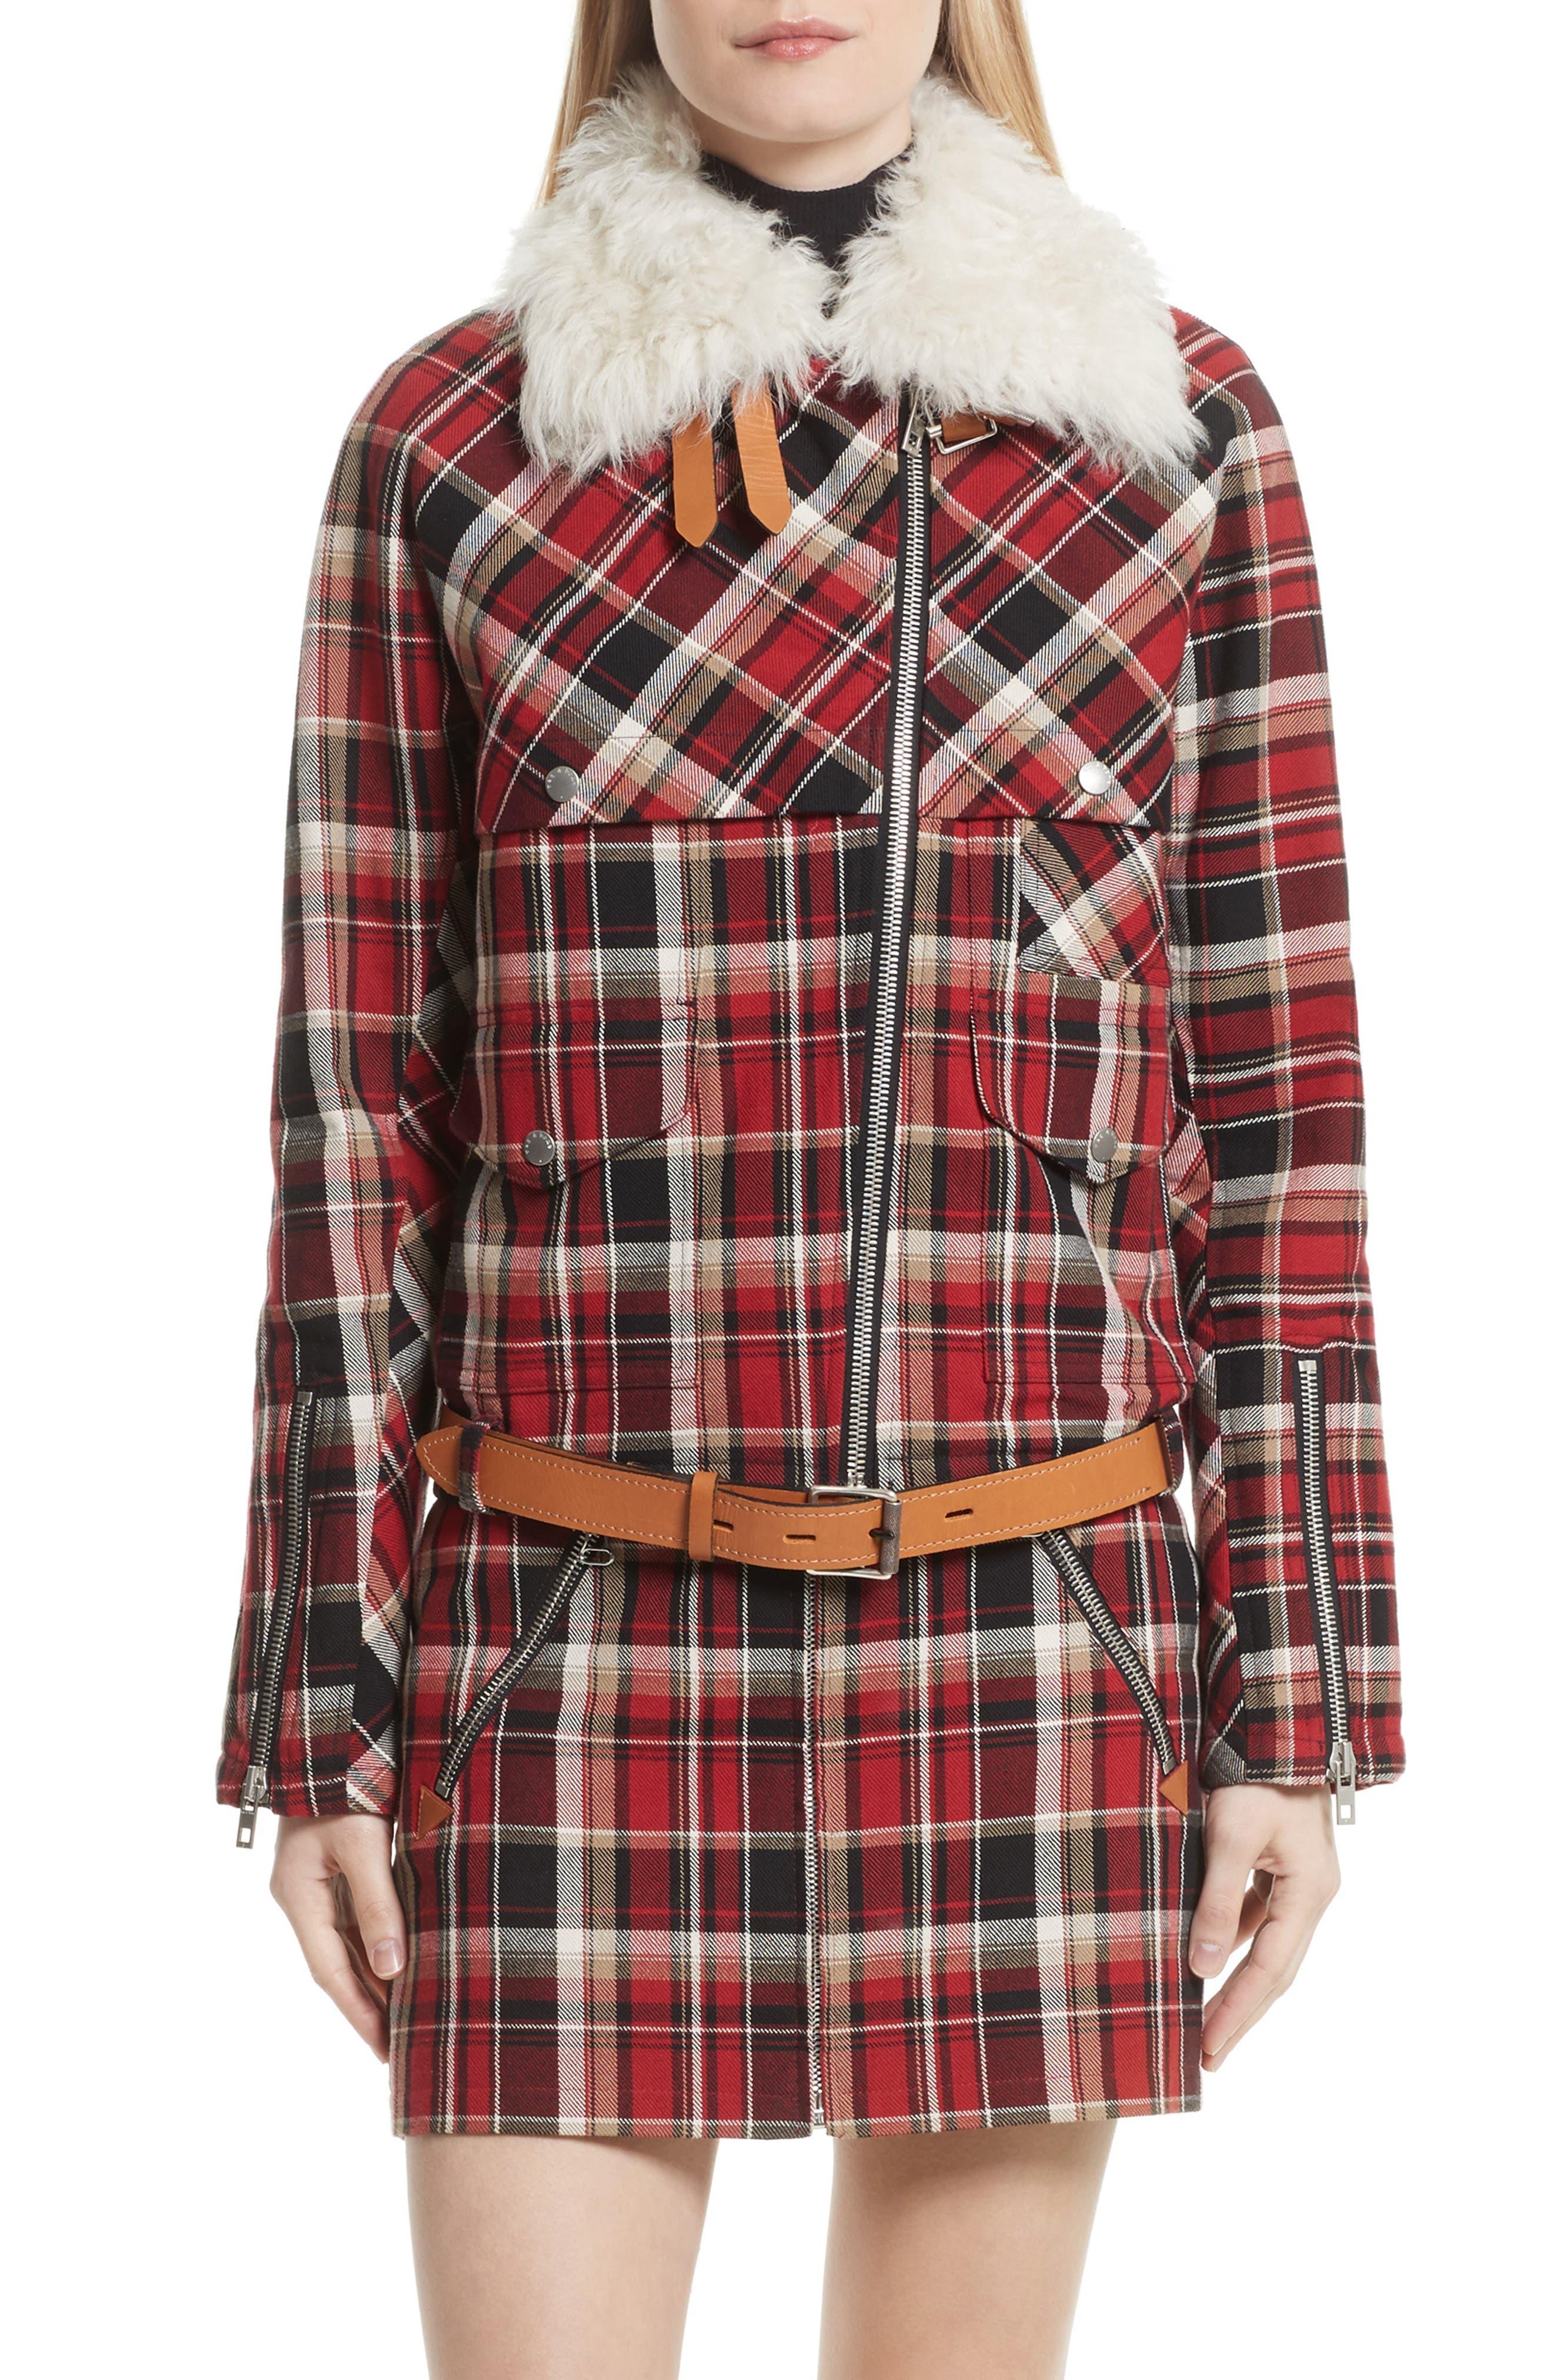 Etiene Plaid Jacket with Genuine Lamb Fur Collar,                         Main,                         color, Red Multi